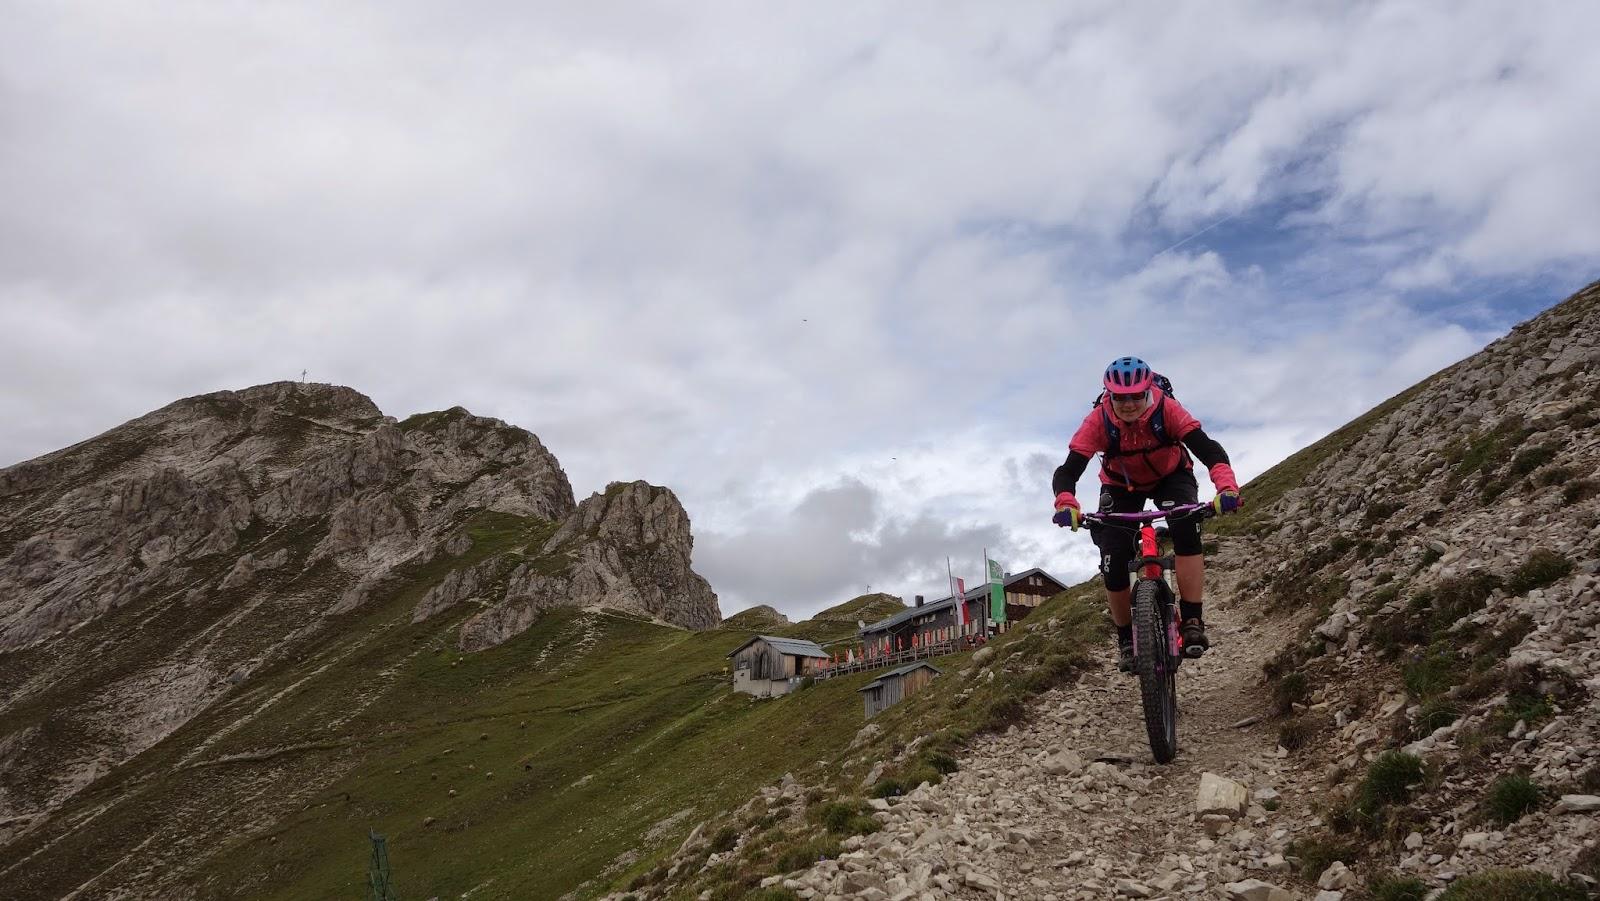 Mountainbike Tour: Nördlinger Hütte (Reither Spitze)